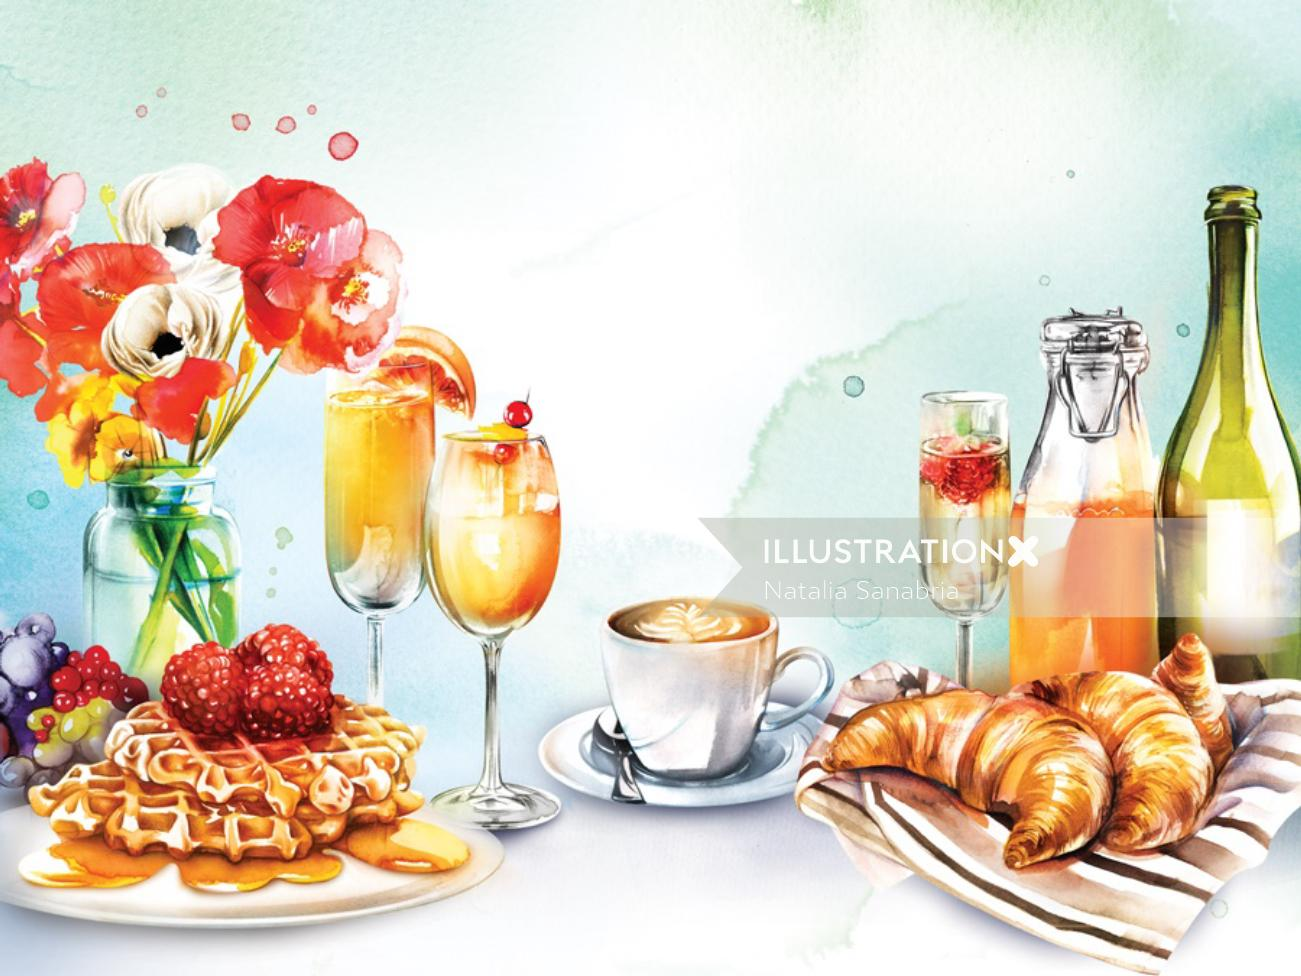 Graphic design of brunch